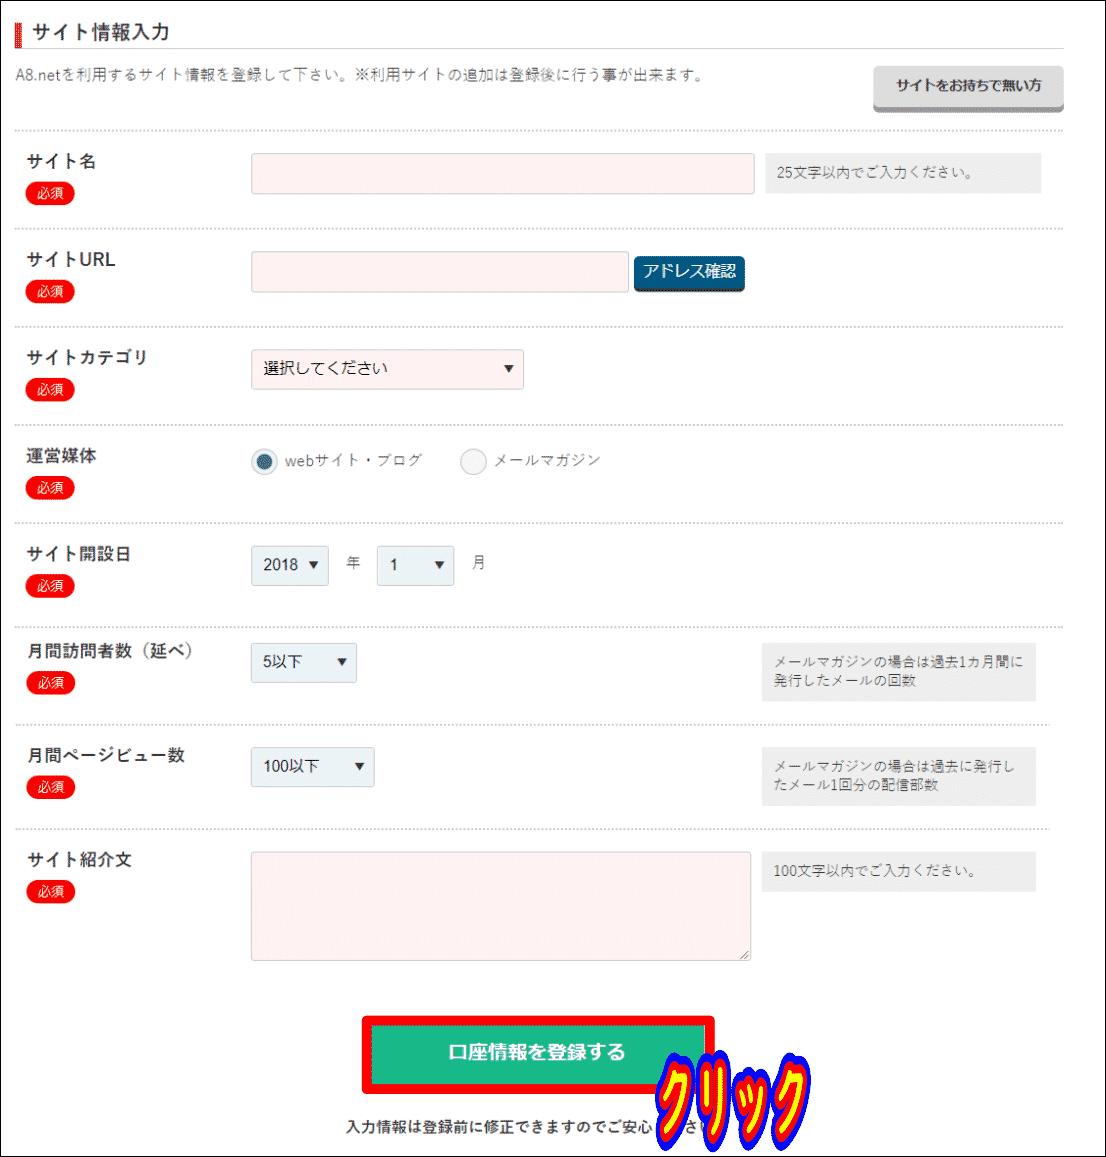 A8ネットの登録手順 サイト情報を登録していき「口座情報を登録する」をクリック